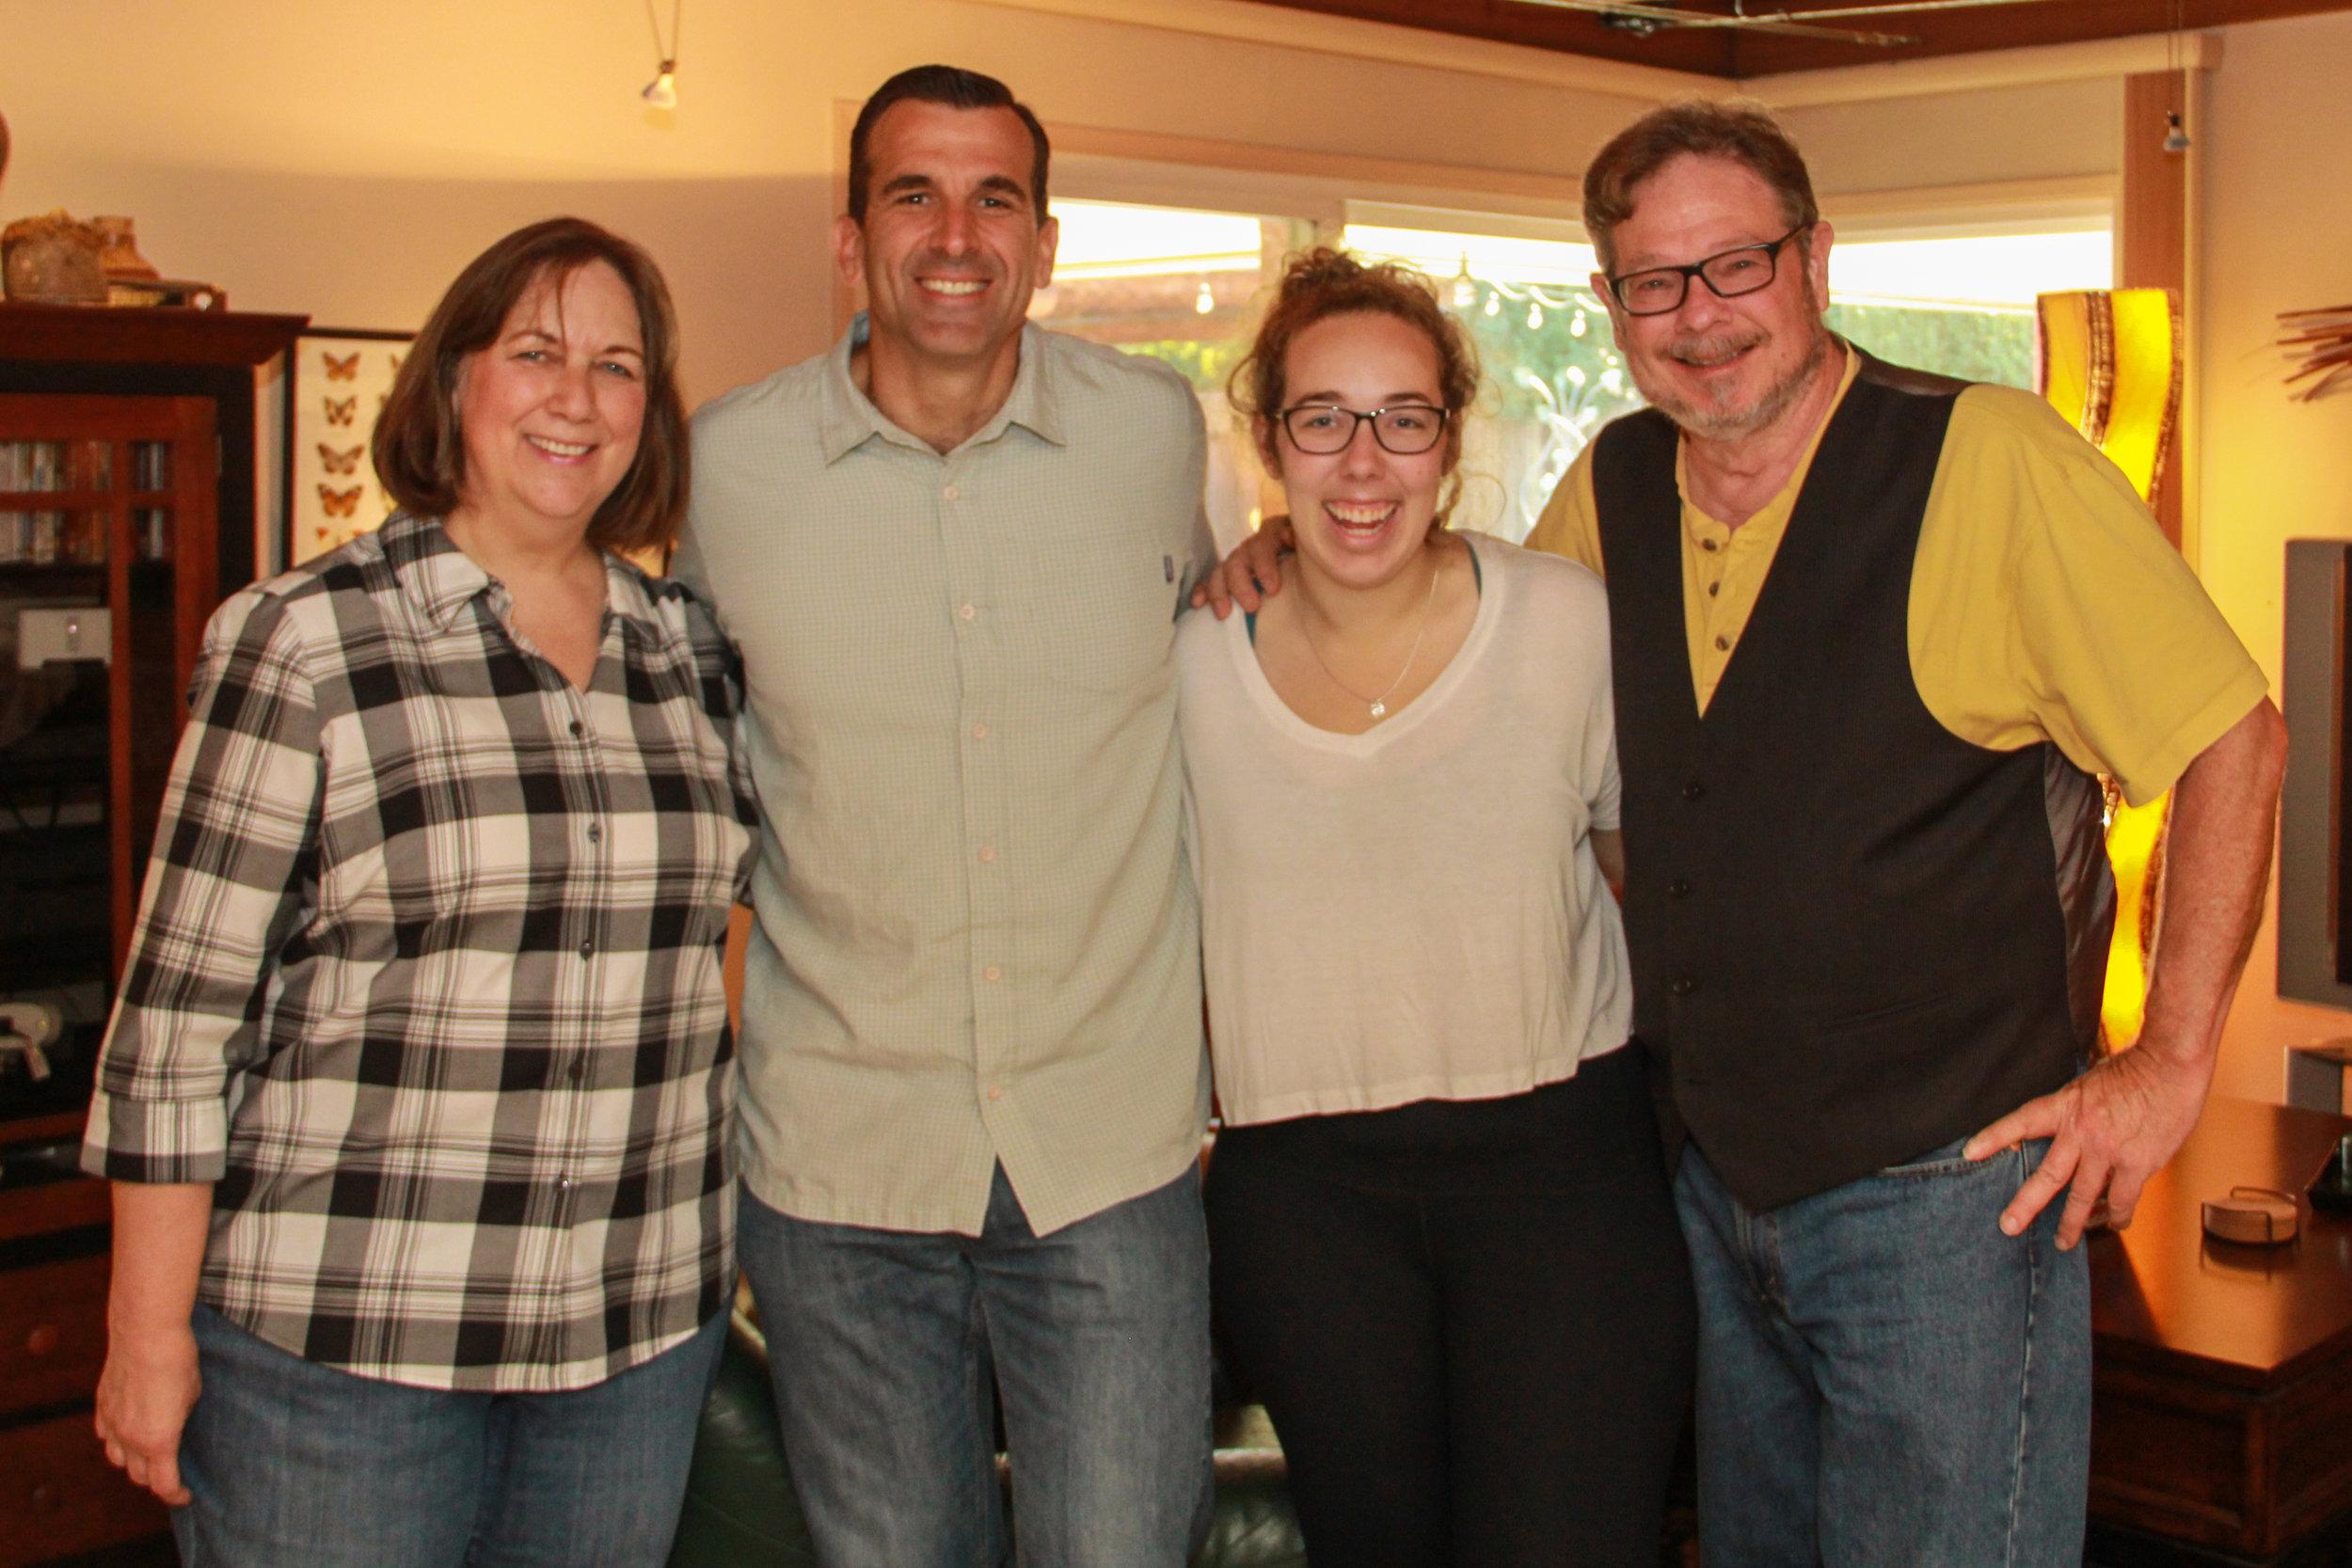 Foley Family & Mayor Liccardo